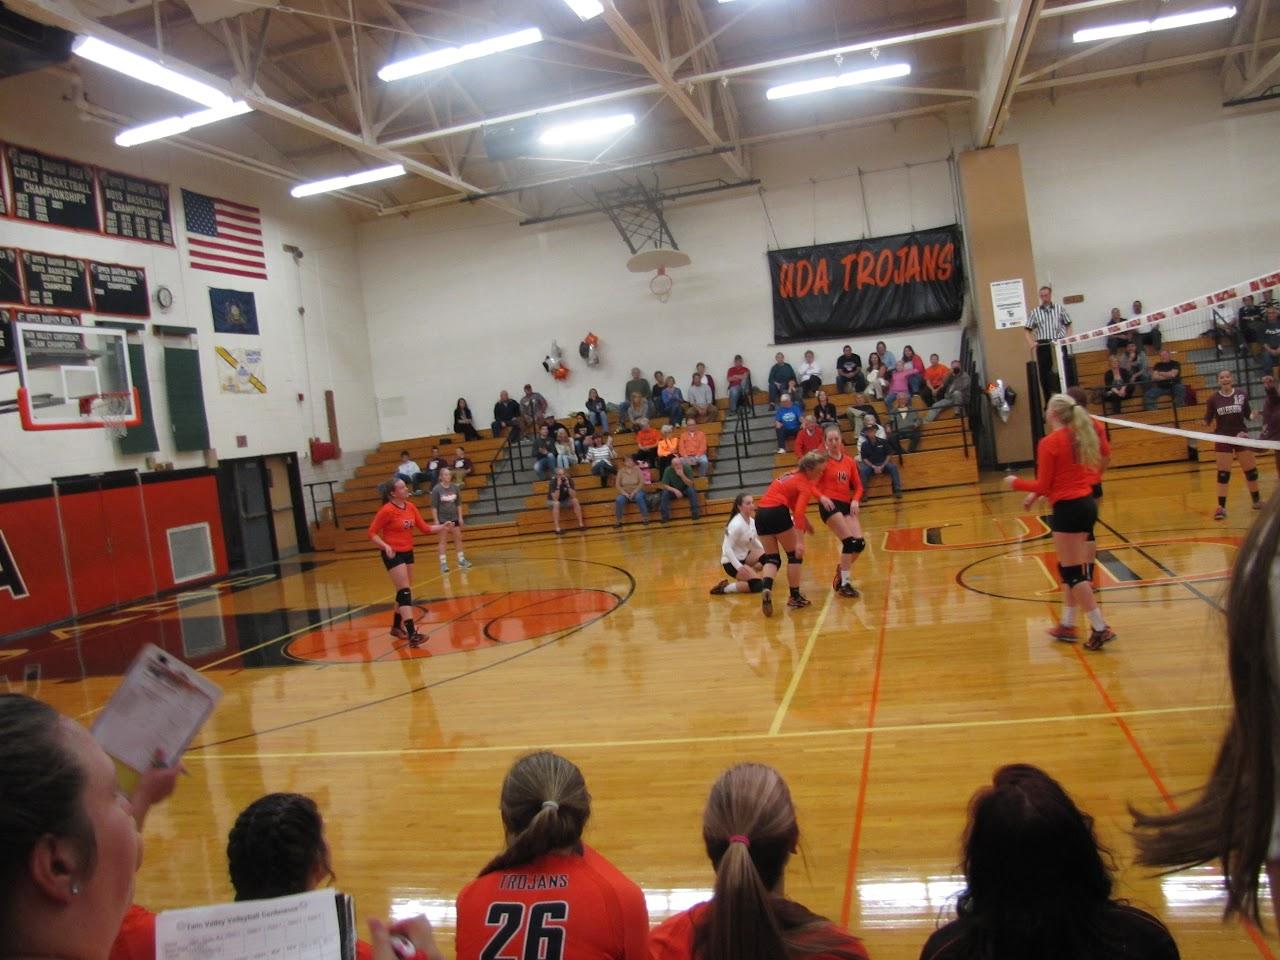 Volleyball-Millersburg vs UDA - IMG_7559.JPG